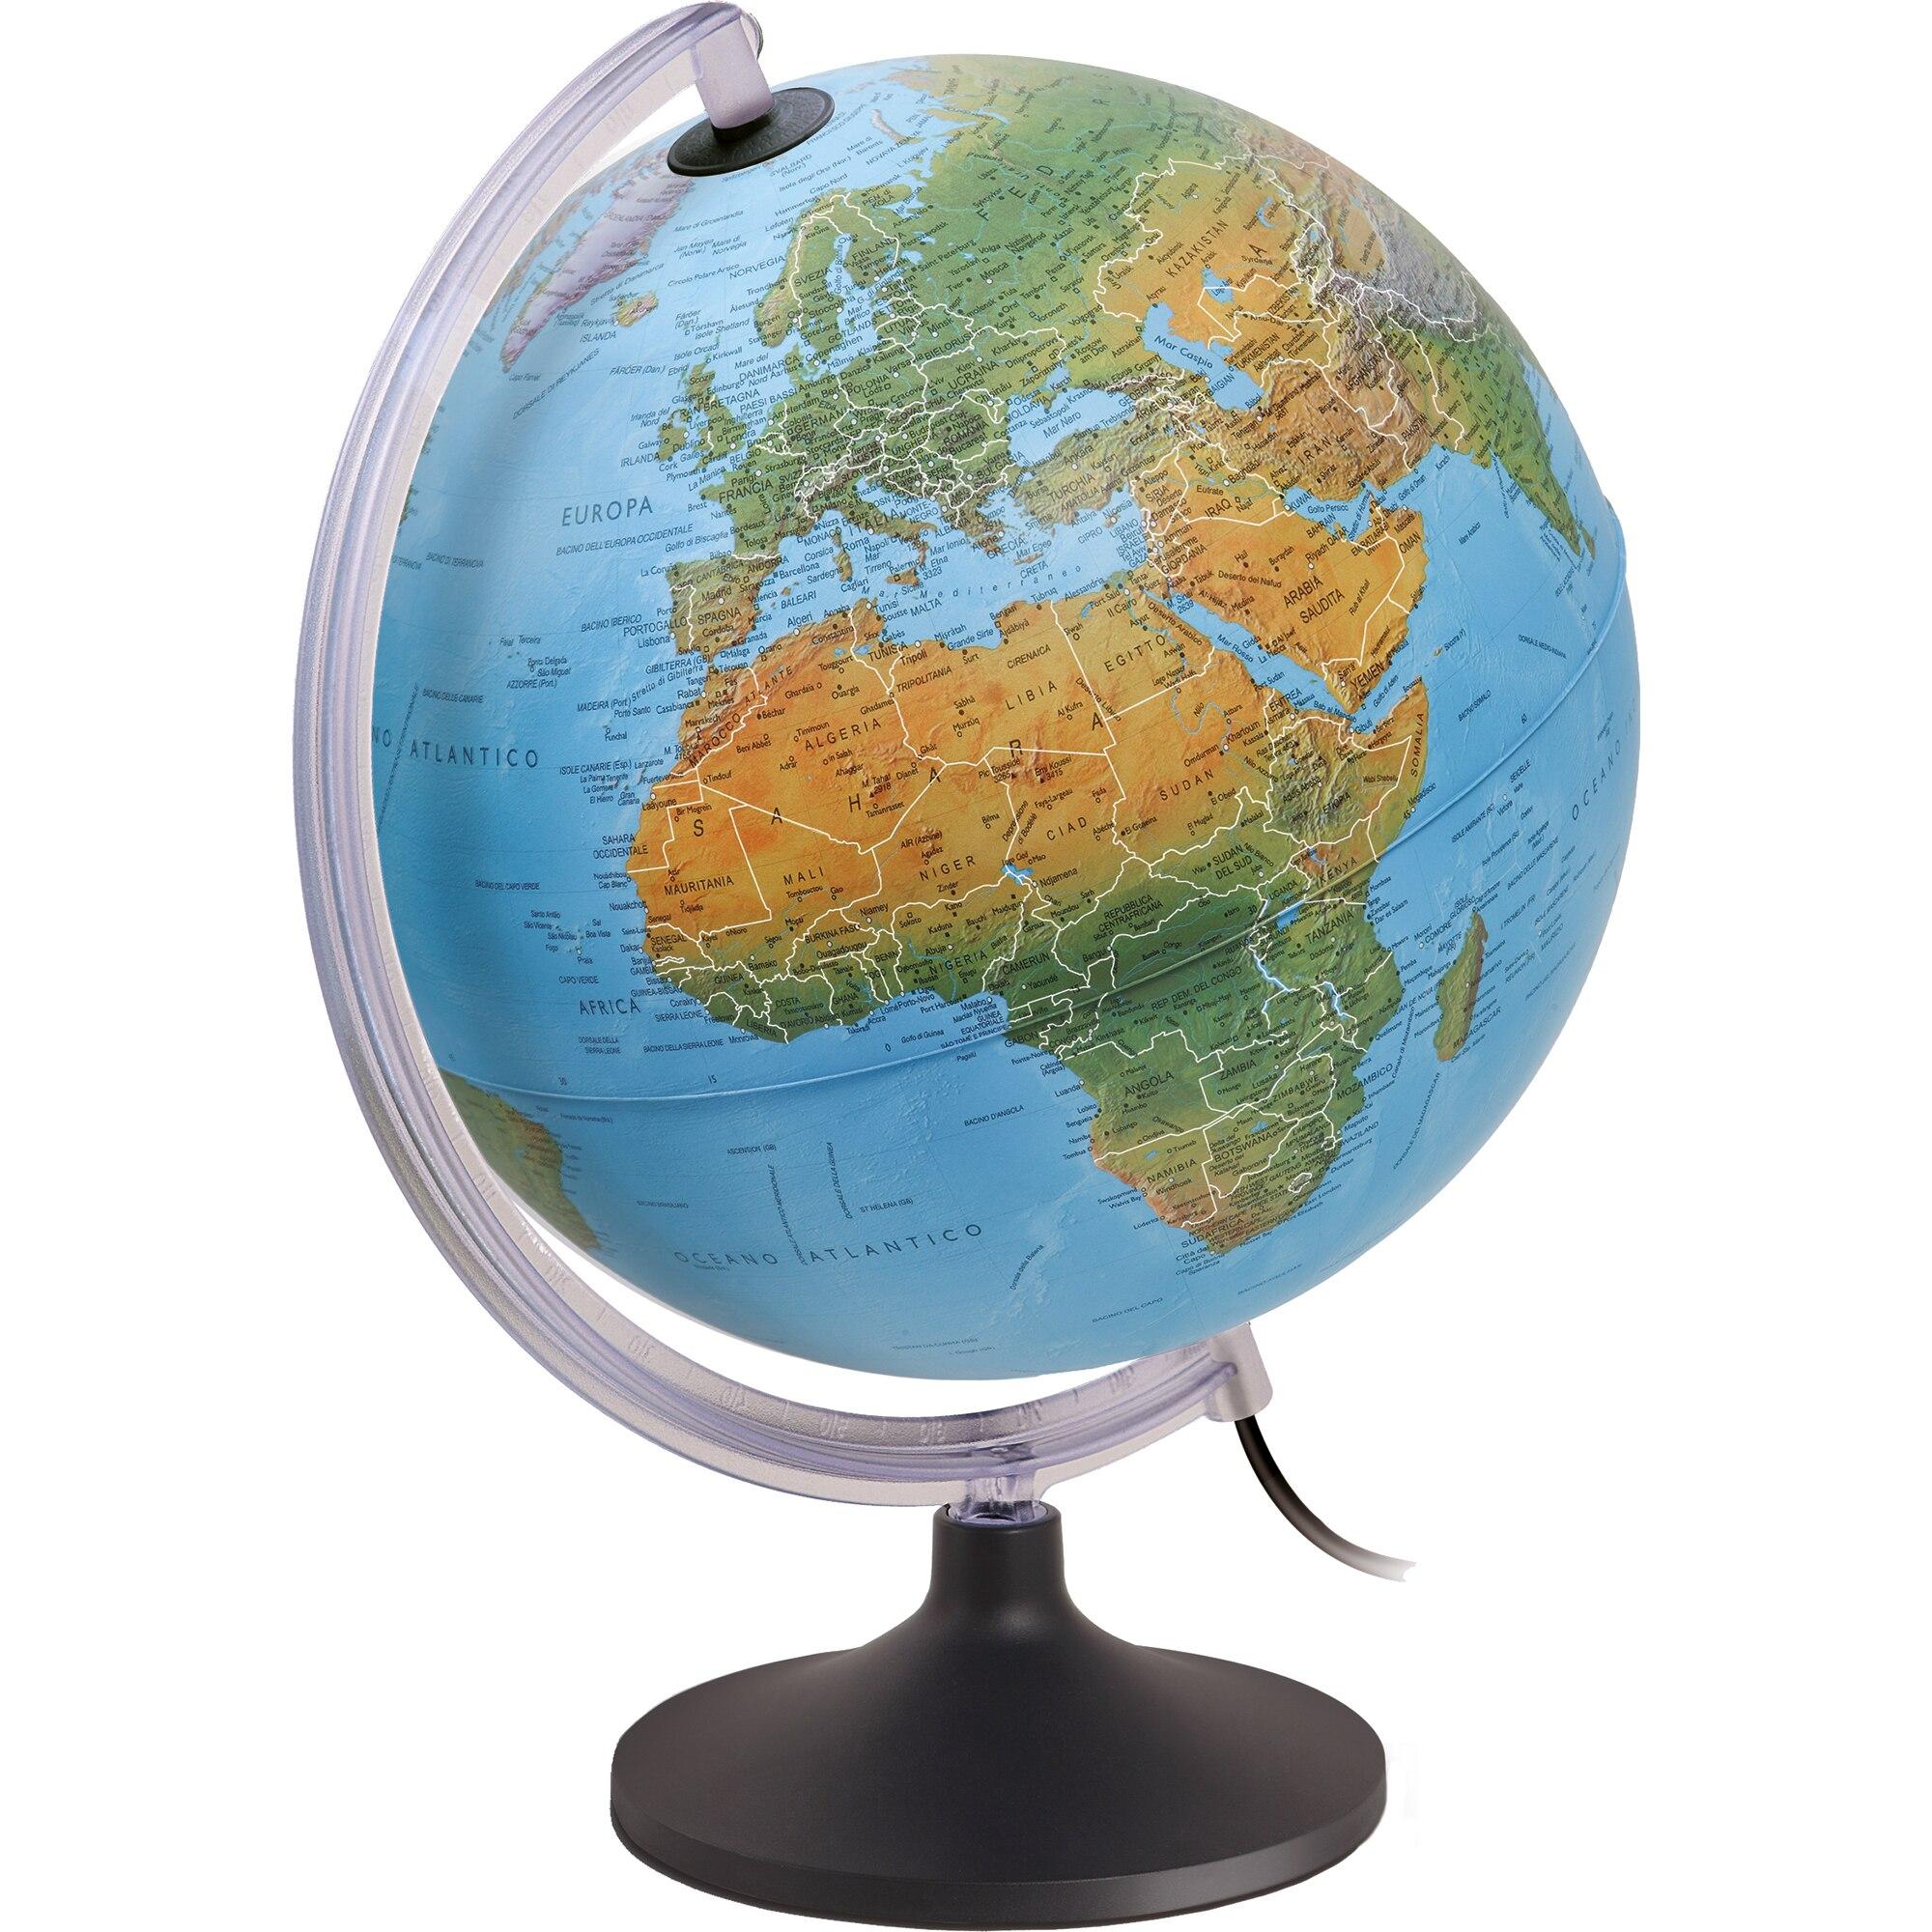 Fotografie Glob pamantesc iluminat Lumierissimo 30 cm cu harta fizica si politica in engleza, capitale si granite iluminate